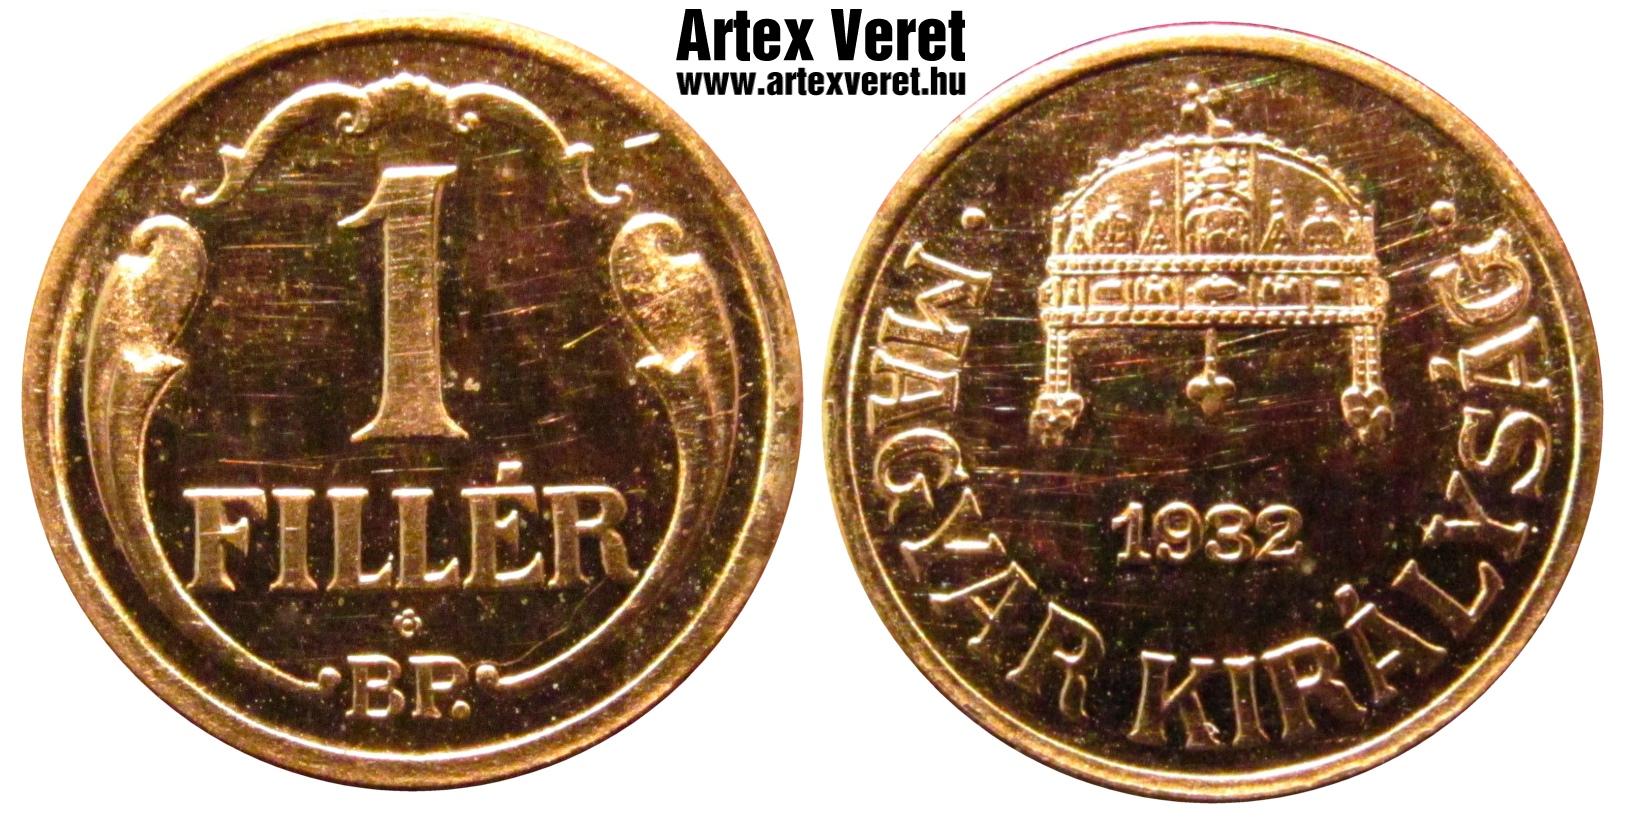 http://www.artexveret.hu/pengo-artex-utanveret/www_artexveret_hu_bronz_1932_rozettas_artex_utanveret_1_filler.jpg